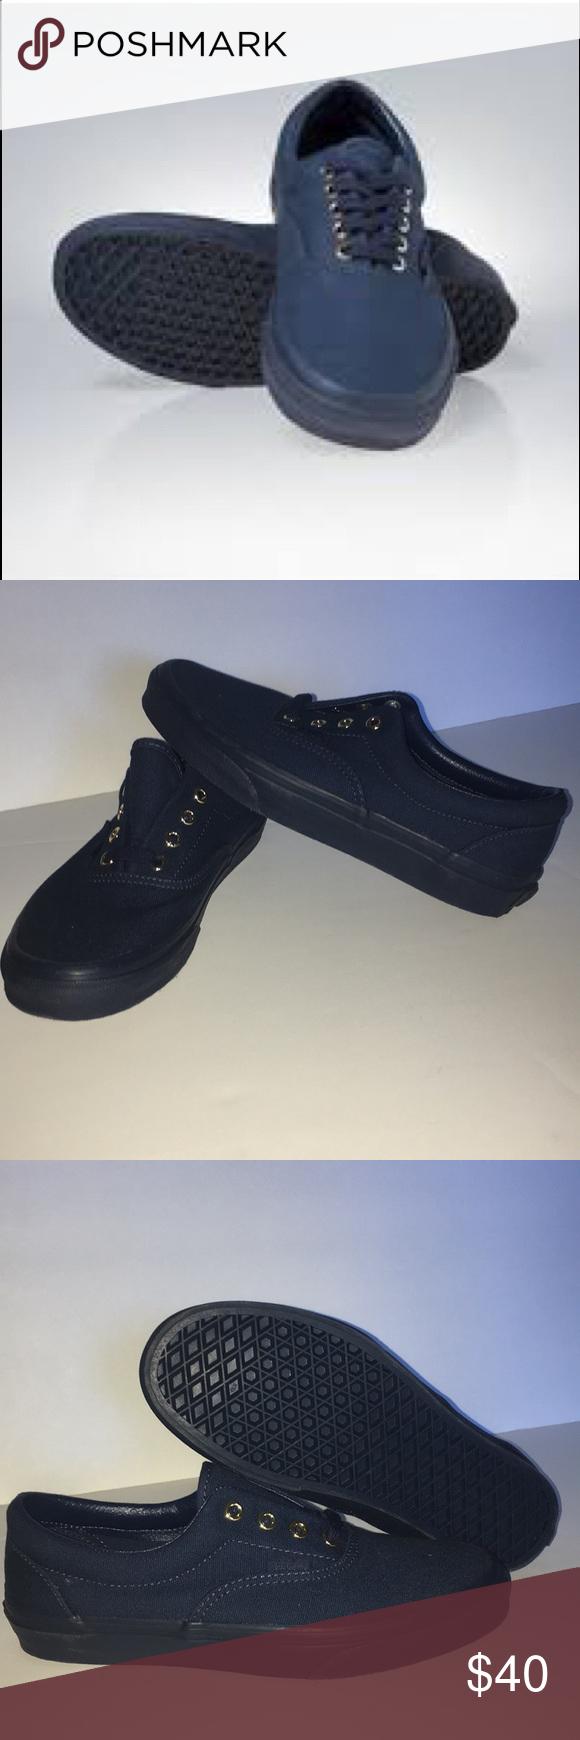 fa999cdb16 Vans Era (Gold Mono) Brand new in box! Vans Era (Gold Mono) Dress Blue Size  6.0 Men